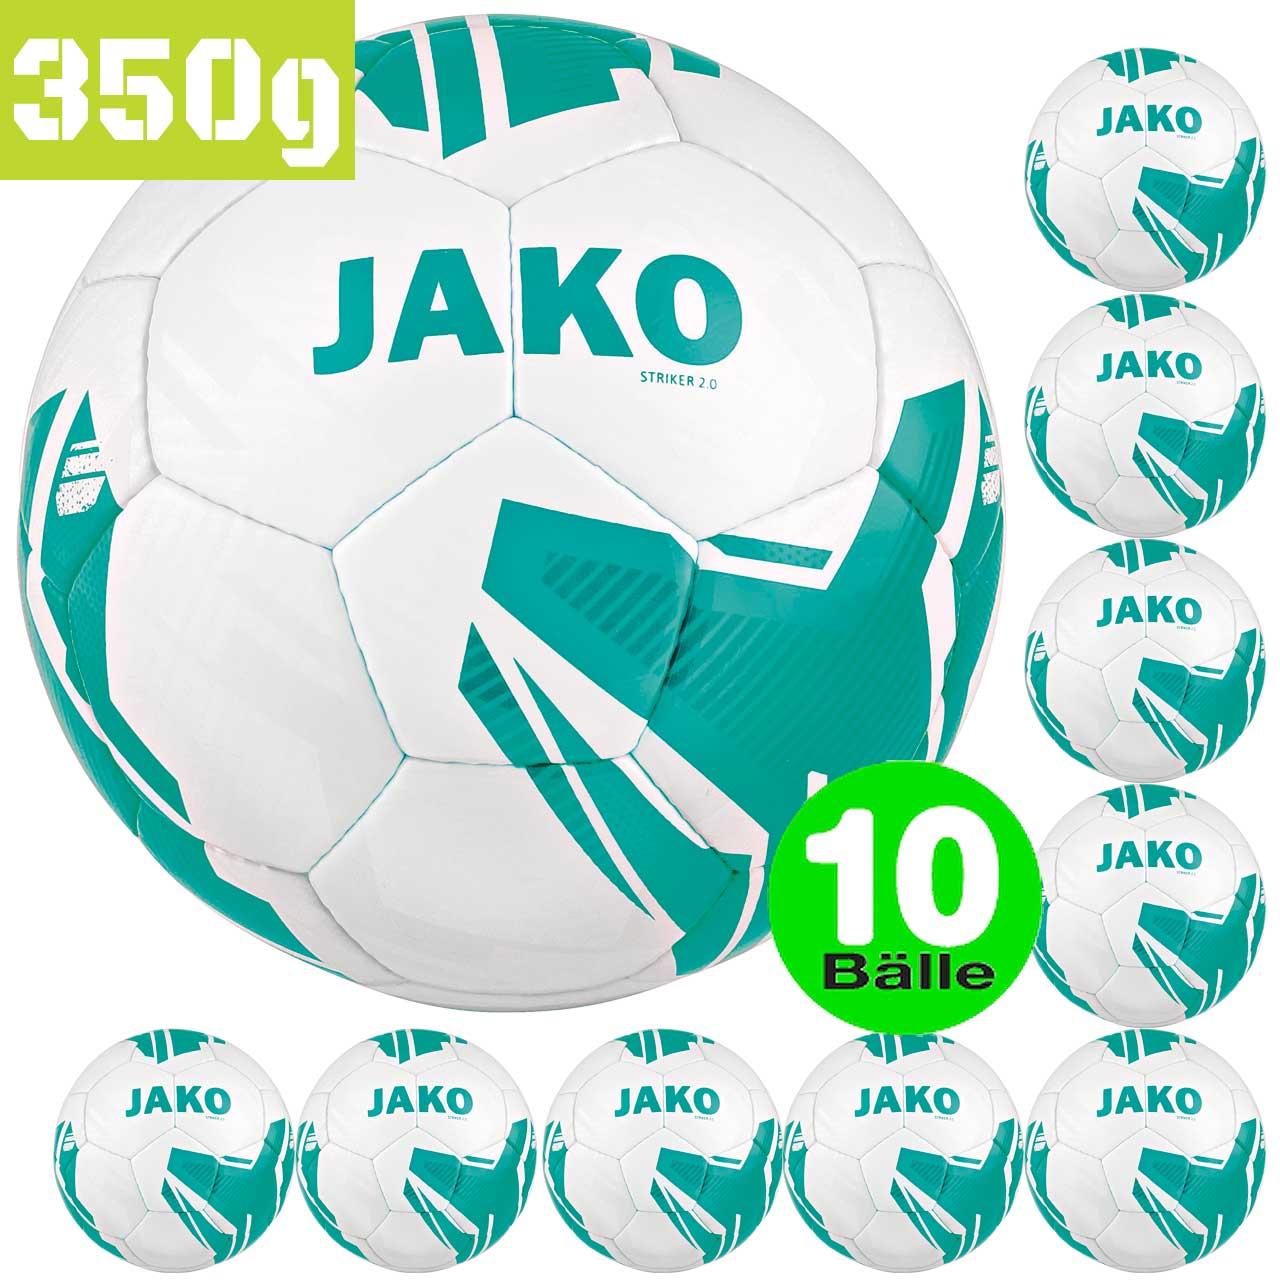 Ballpakete | Sport HAAS Online